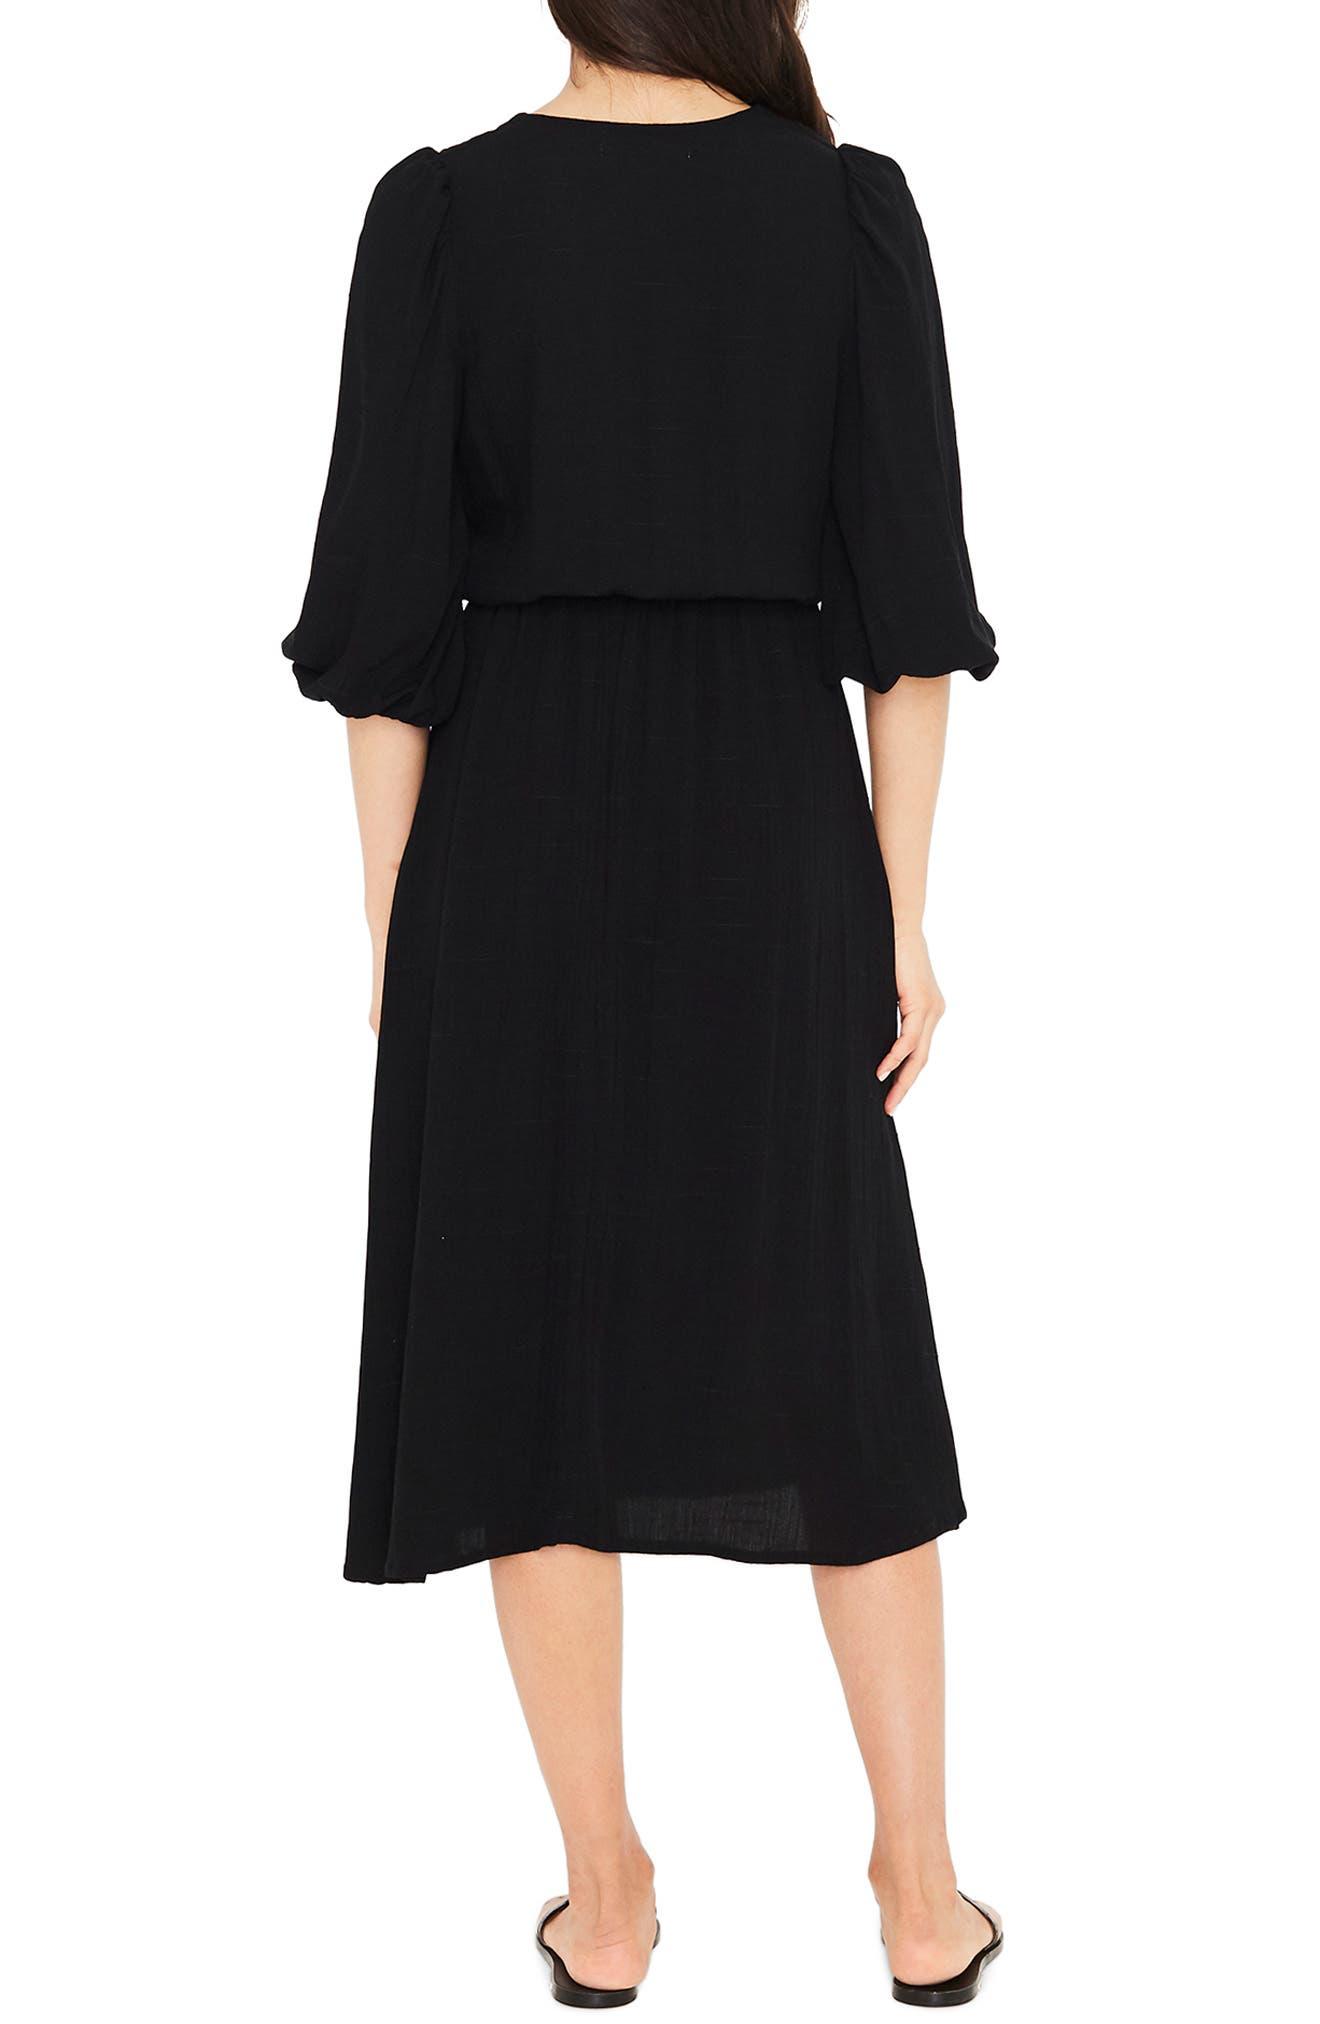 Tobago Tie Front Midi Dress,                             Alternate thumbnail 2, color,                             PLAIN BLACK